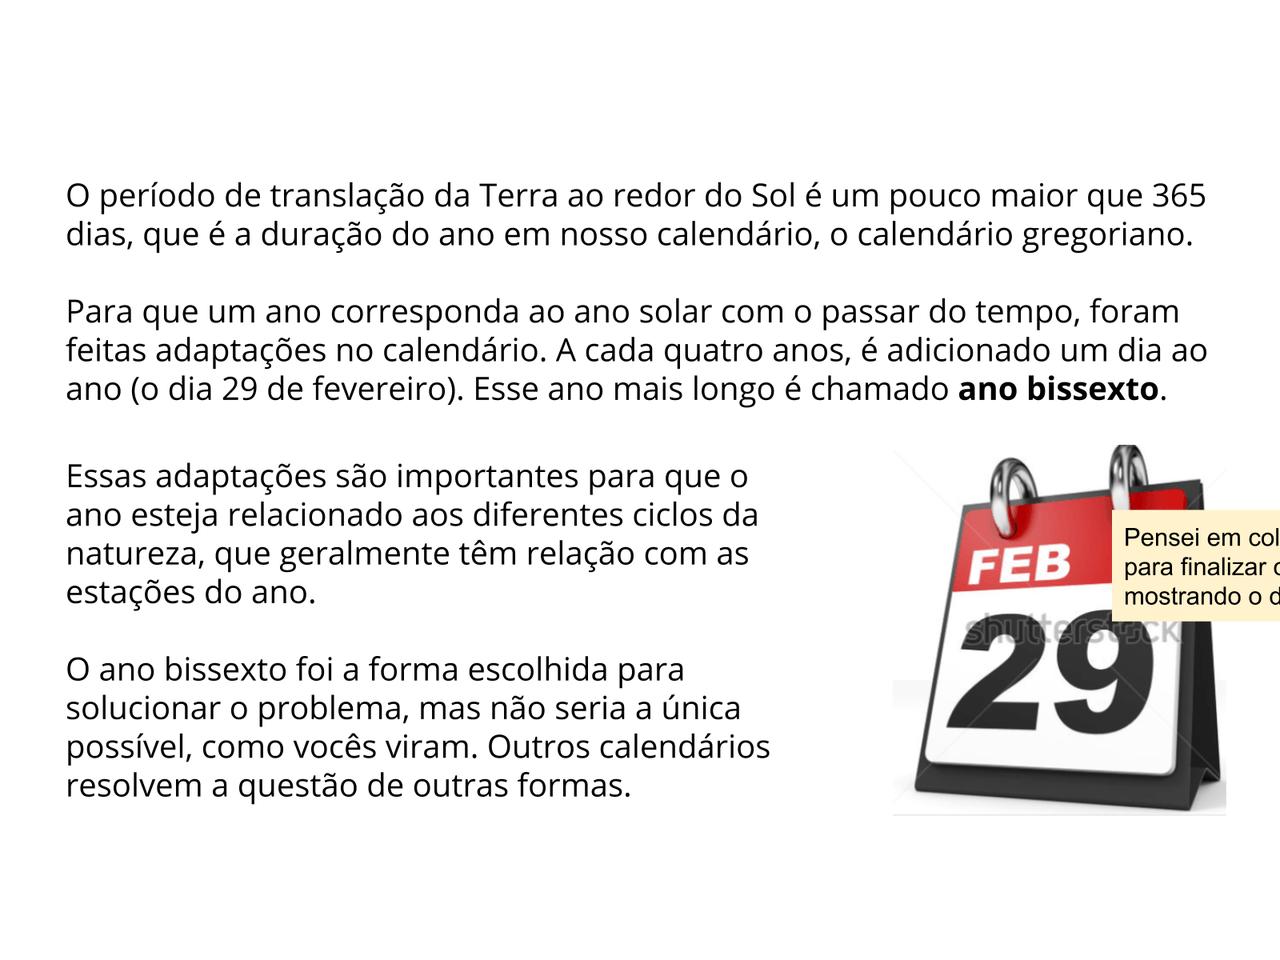 Calendario Gregoriano.Plano De Aula 4º Ano Ciencias Adaptacoes Do Calendario